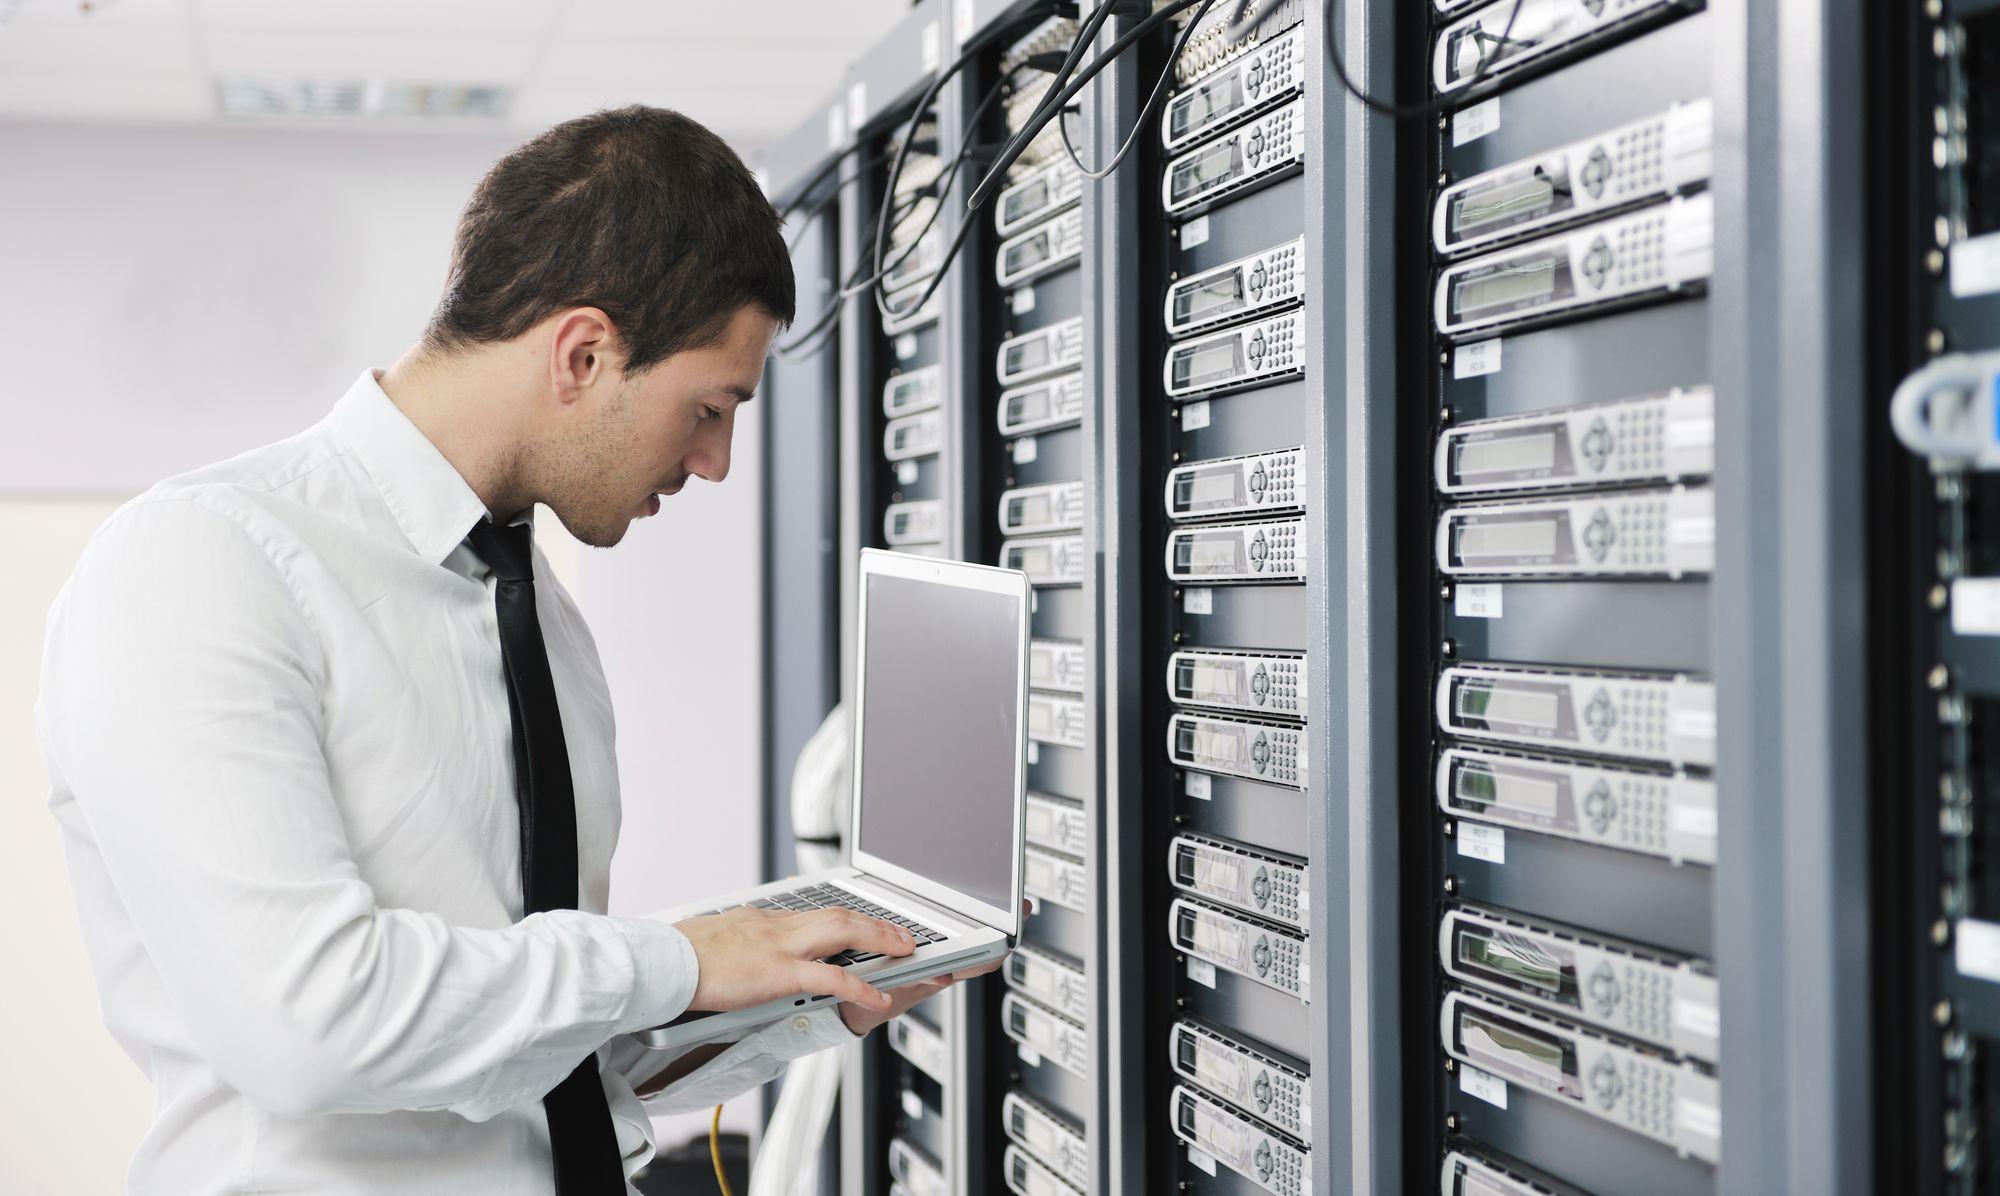 Network Administrator | Nellai Help Line